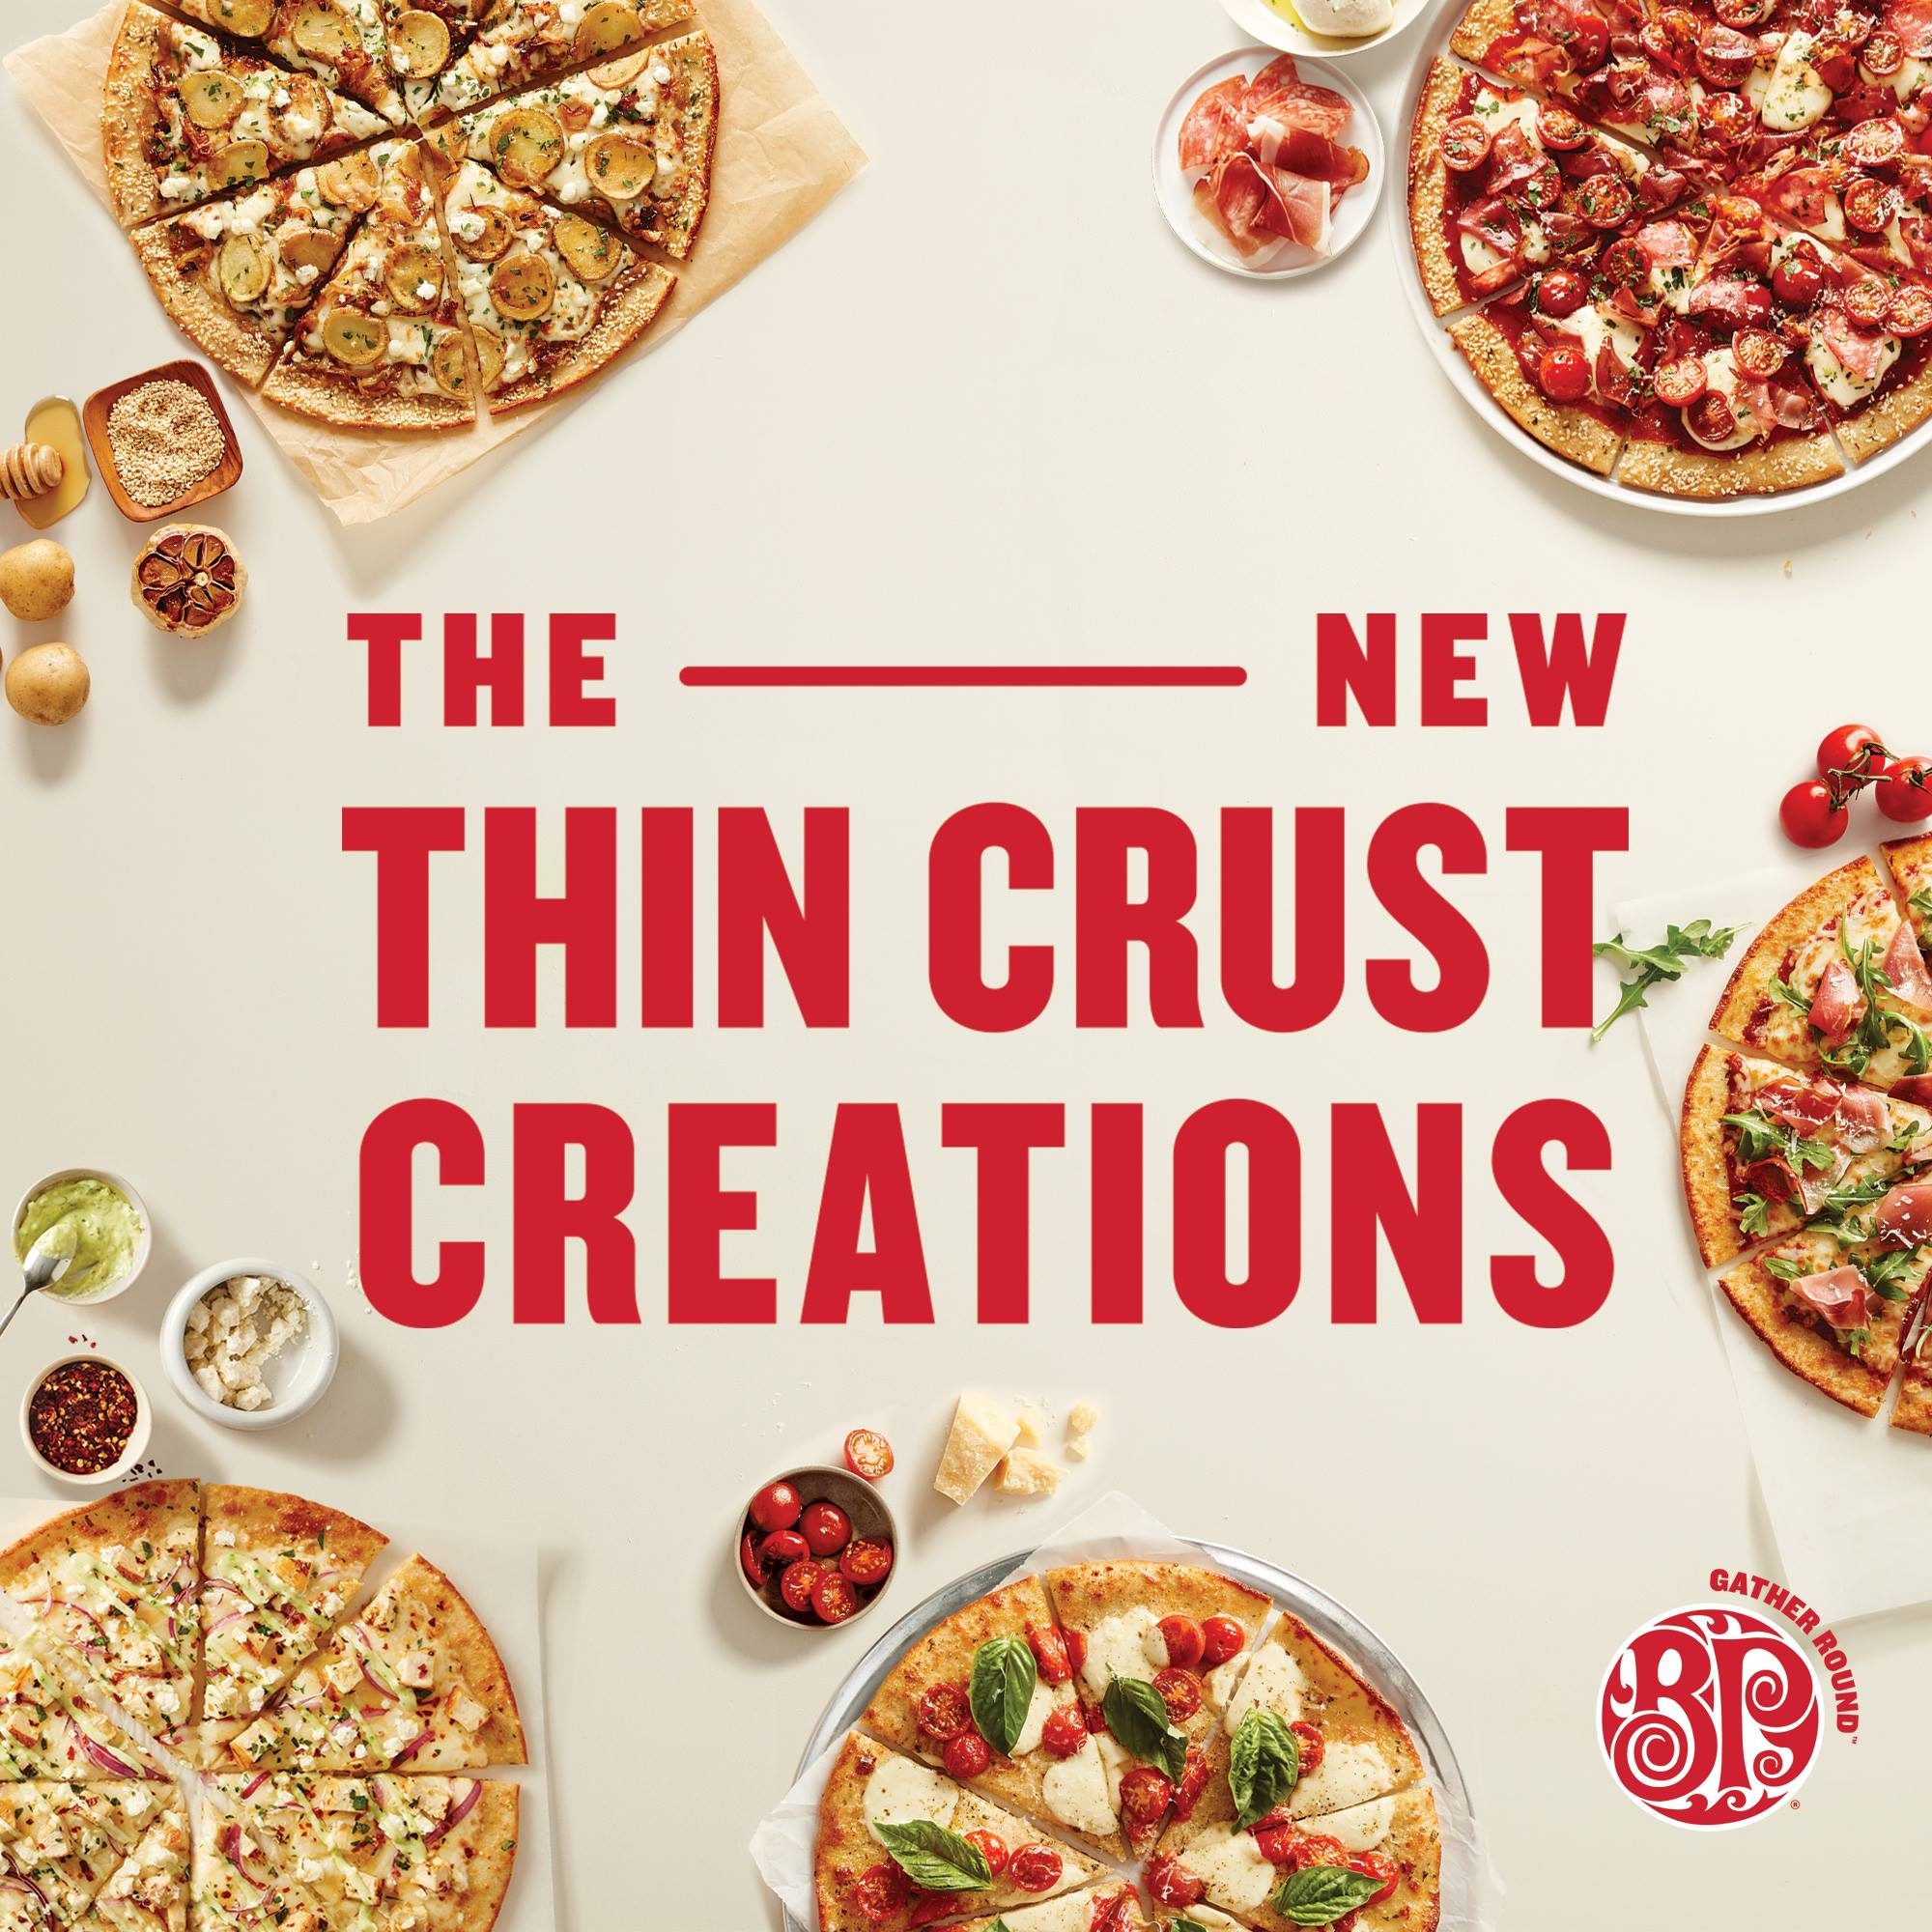 Boston pizza coupon codes canada